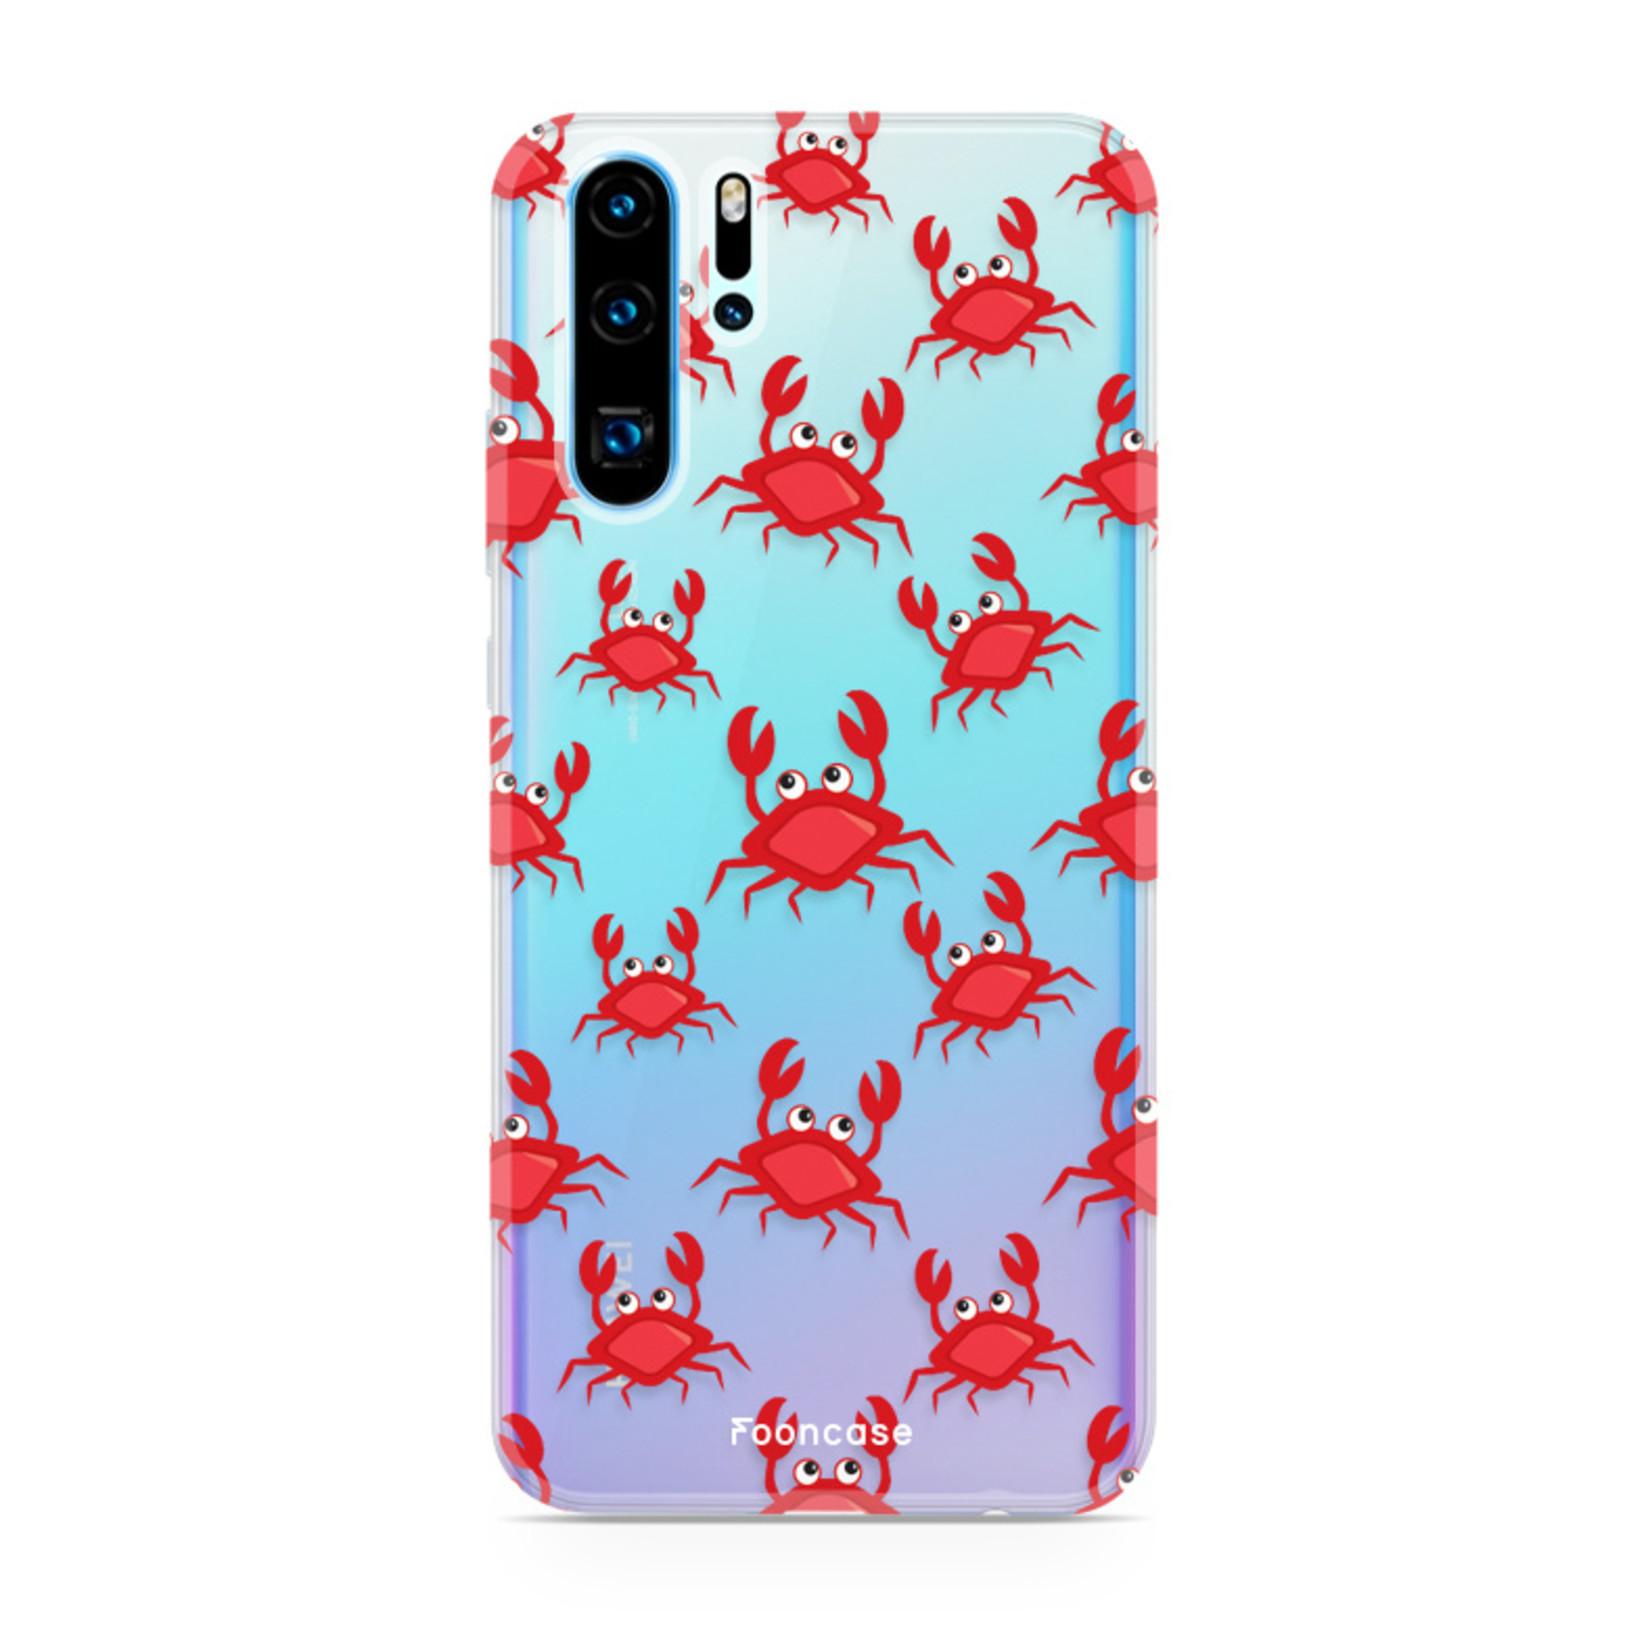 FOONCASE Huawei P30 Pro hoesje TPU Soft Case - Back Cover - Crabs / Krabbetjes / Krabben